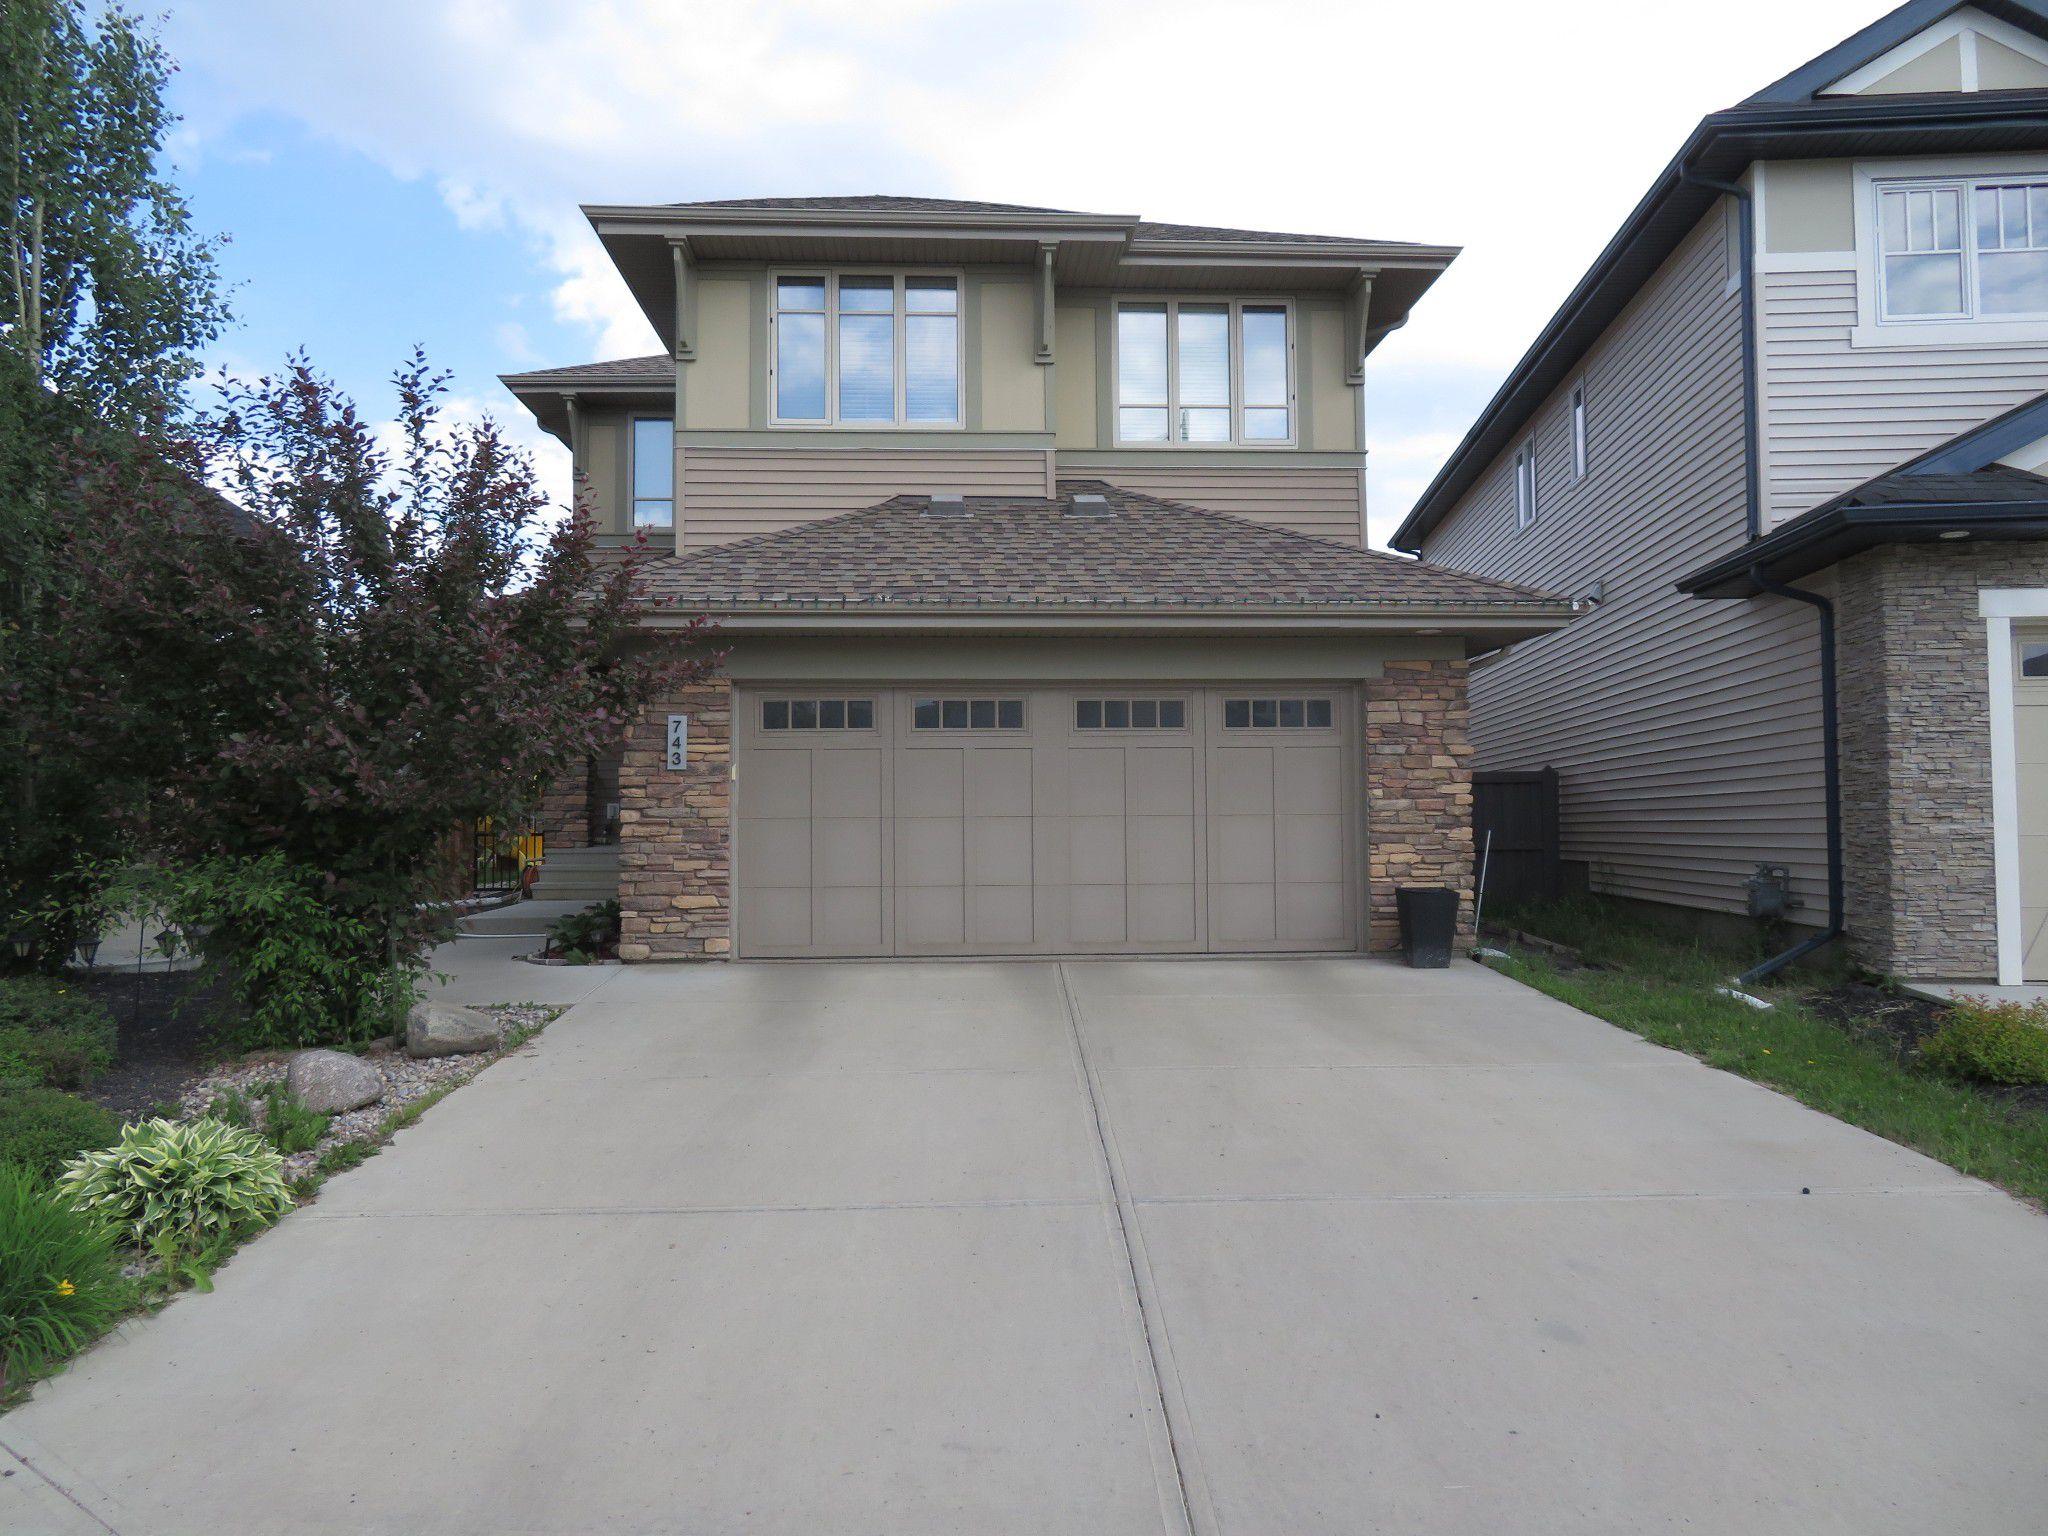 Main Photo: 743 Adams Way SW in EDMONTON: House for sale : MLS®# E4115485